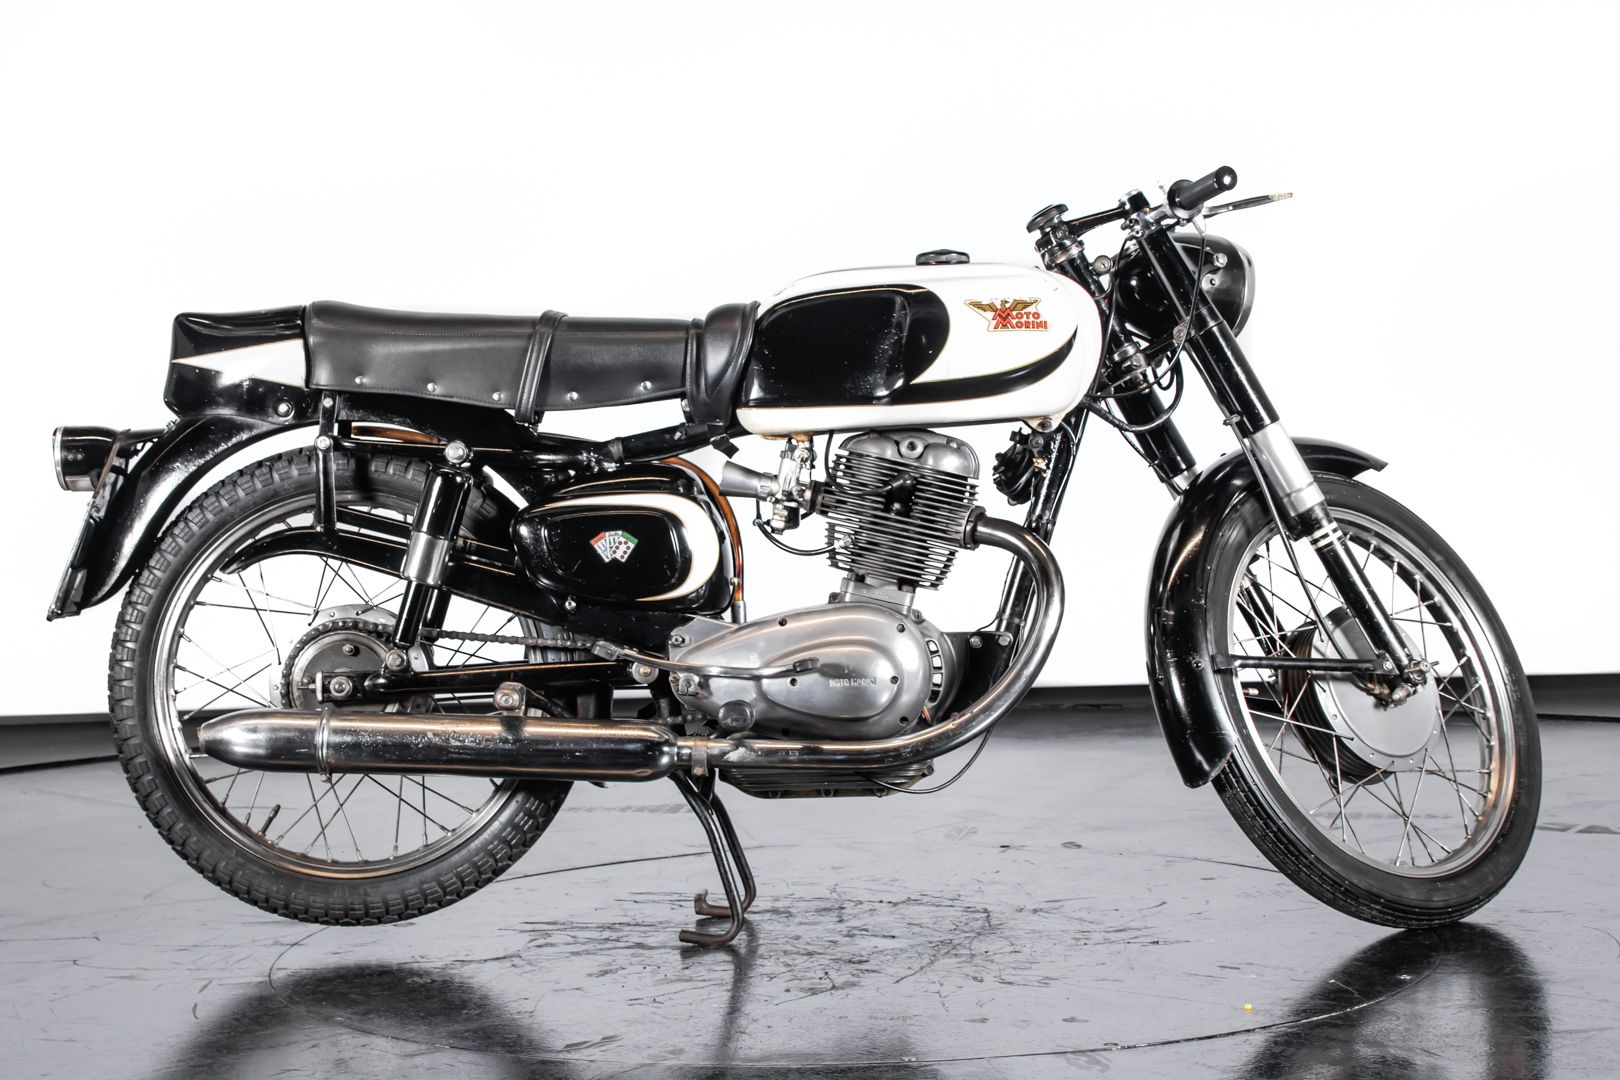 1960 Moto Morini Tresette Sprint 175 76463